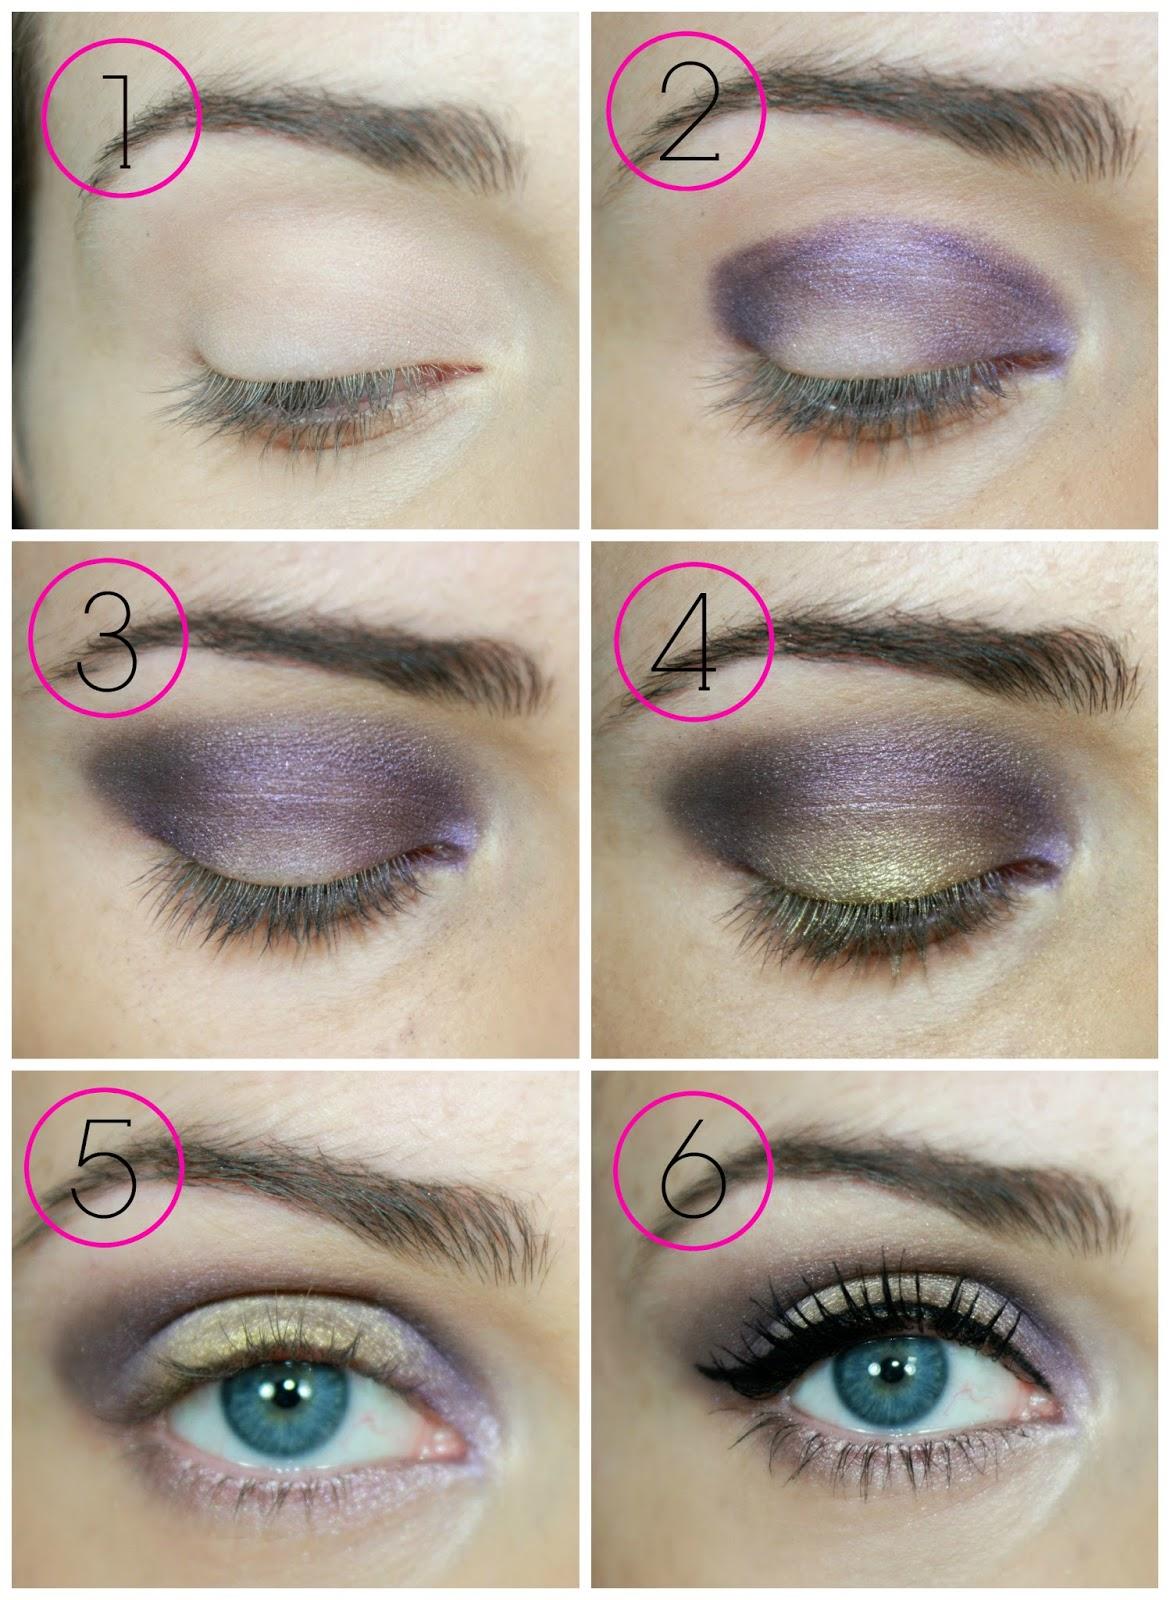 Tuto maquillage 4 couleurs - Tuto de maquillage ...